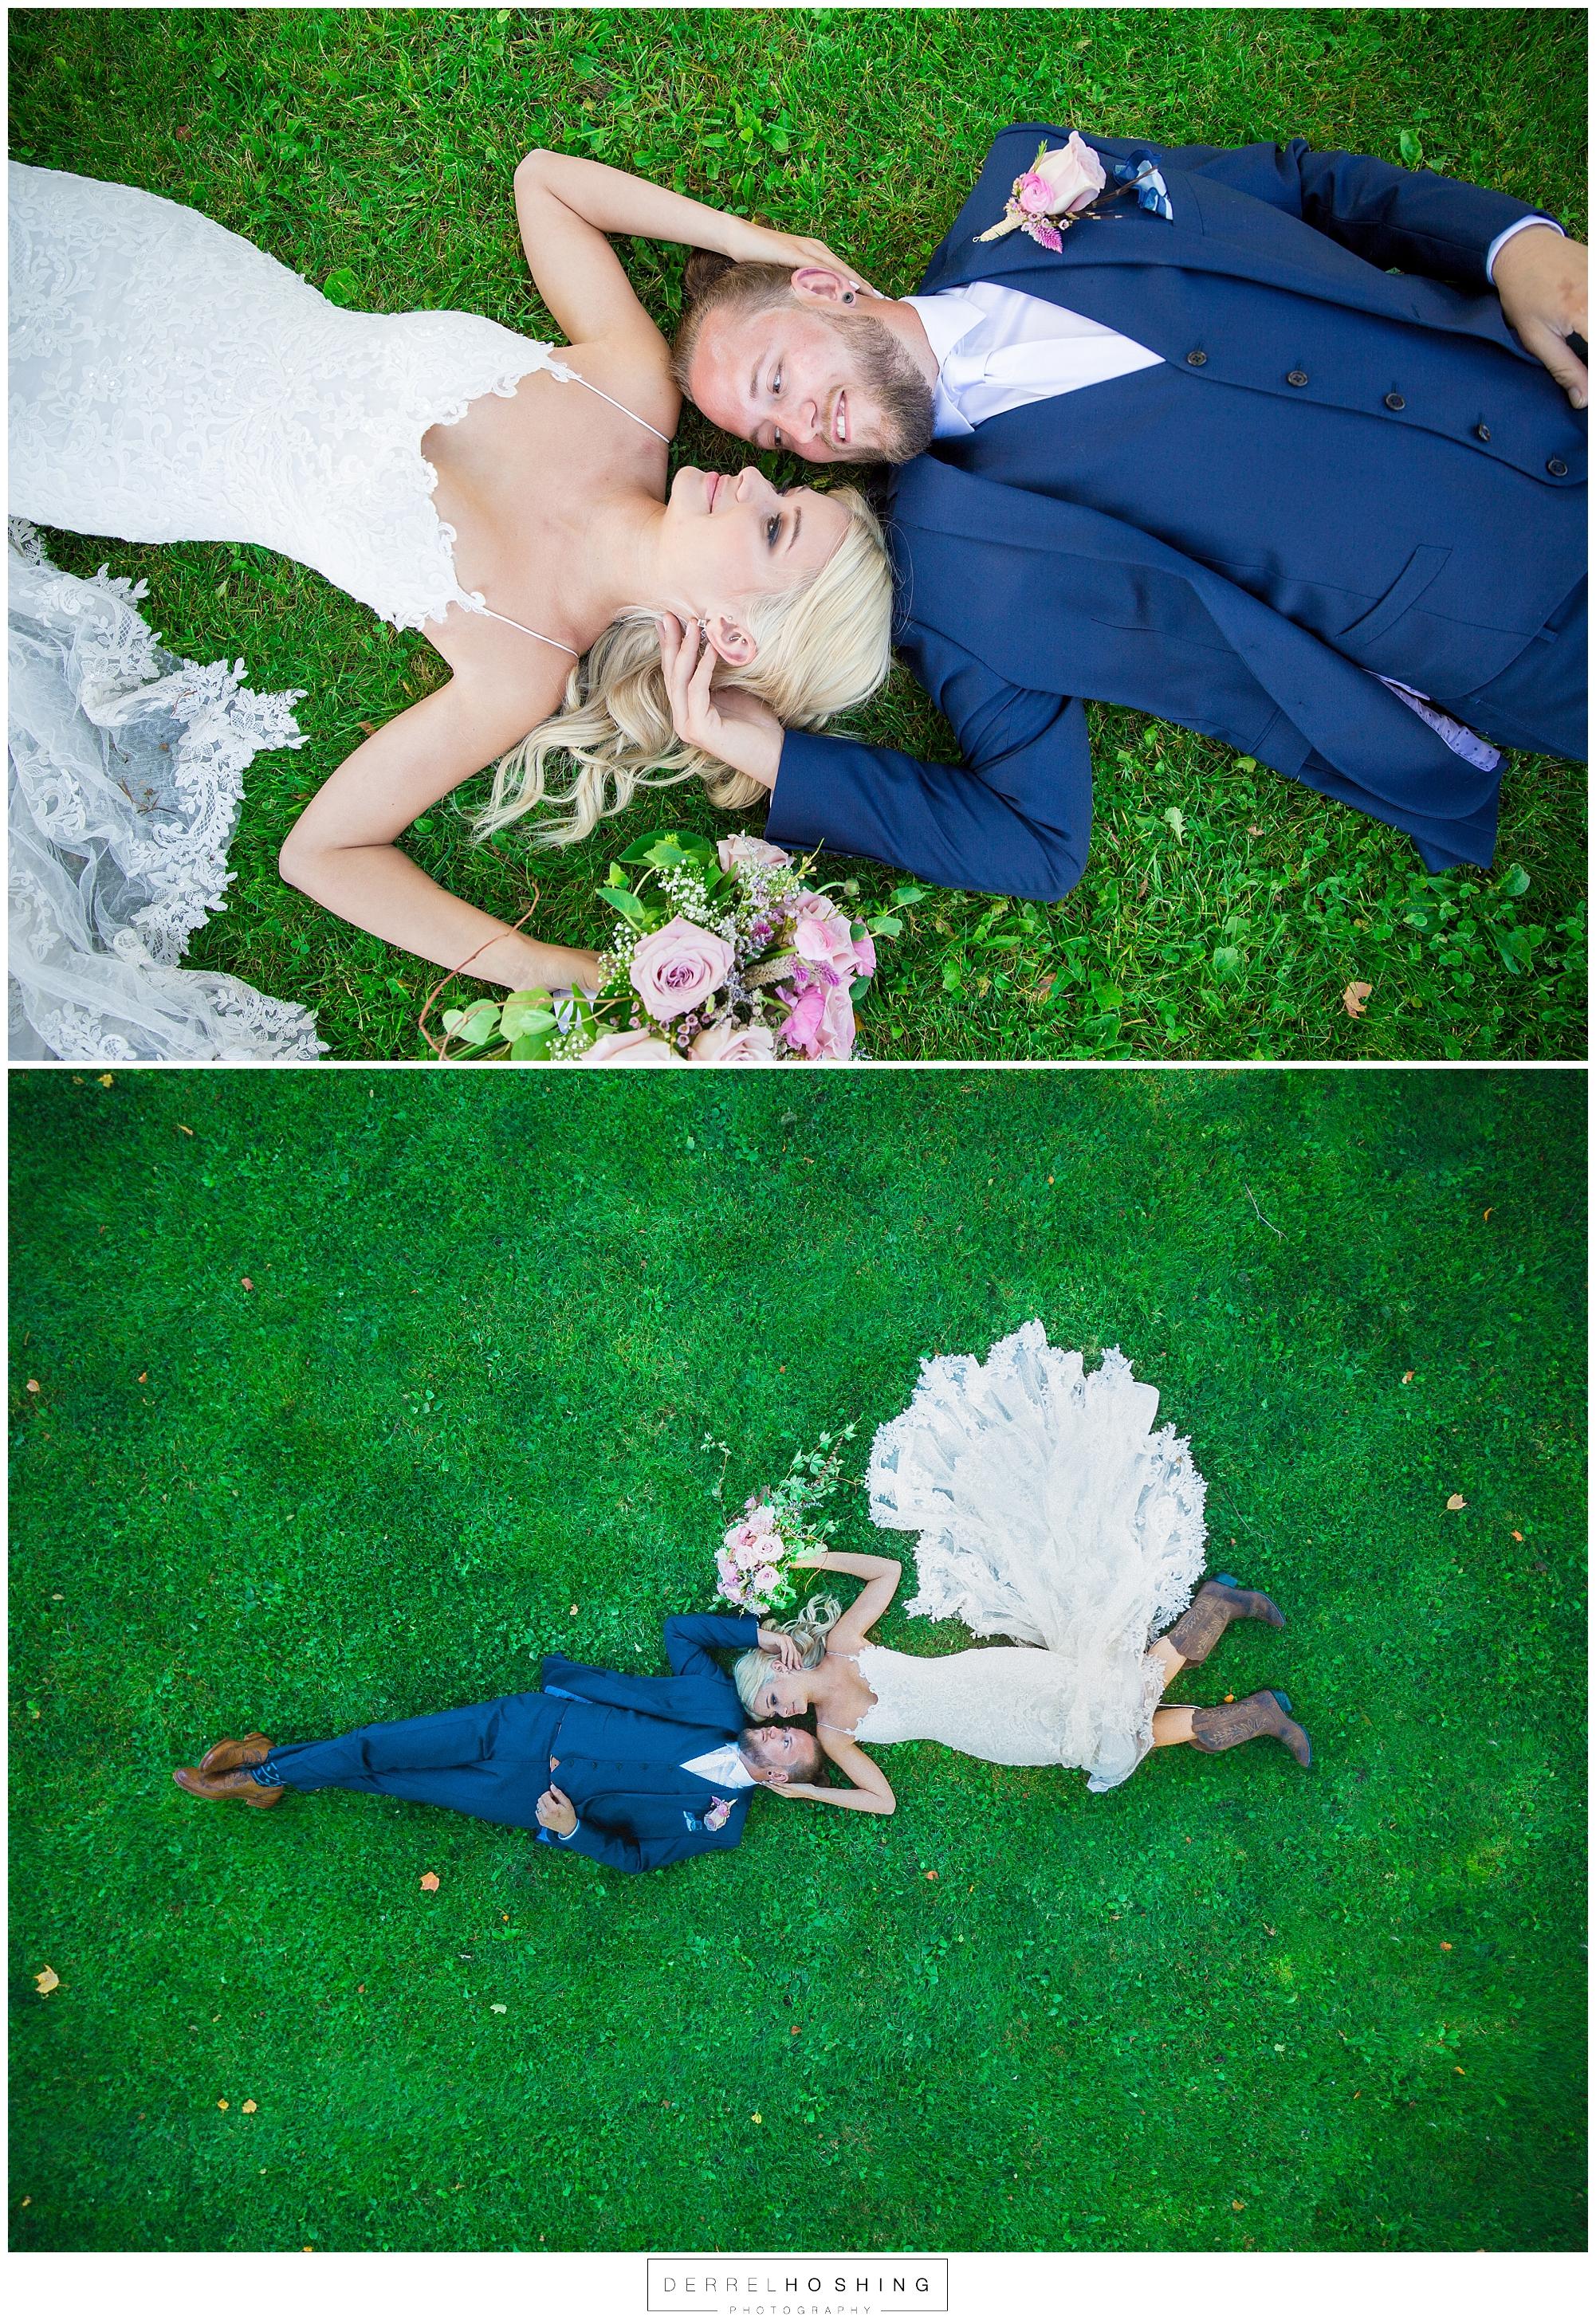 Belcroft-Estates-&-Event-Centre-Wedding-Innisfil-Ontario-0019.jpg